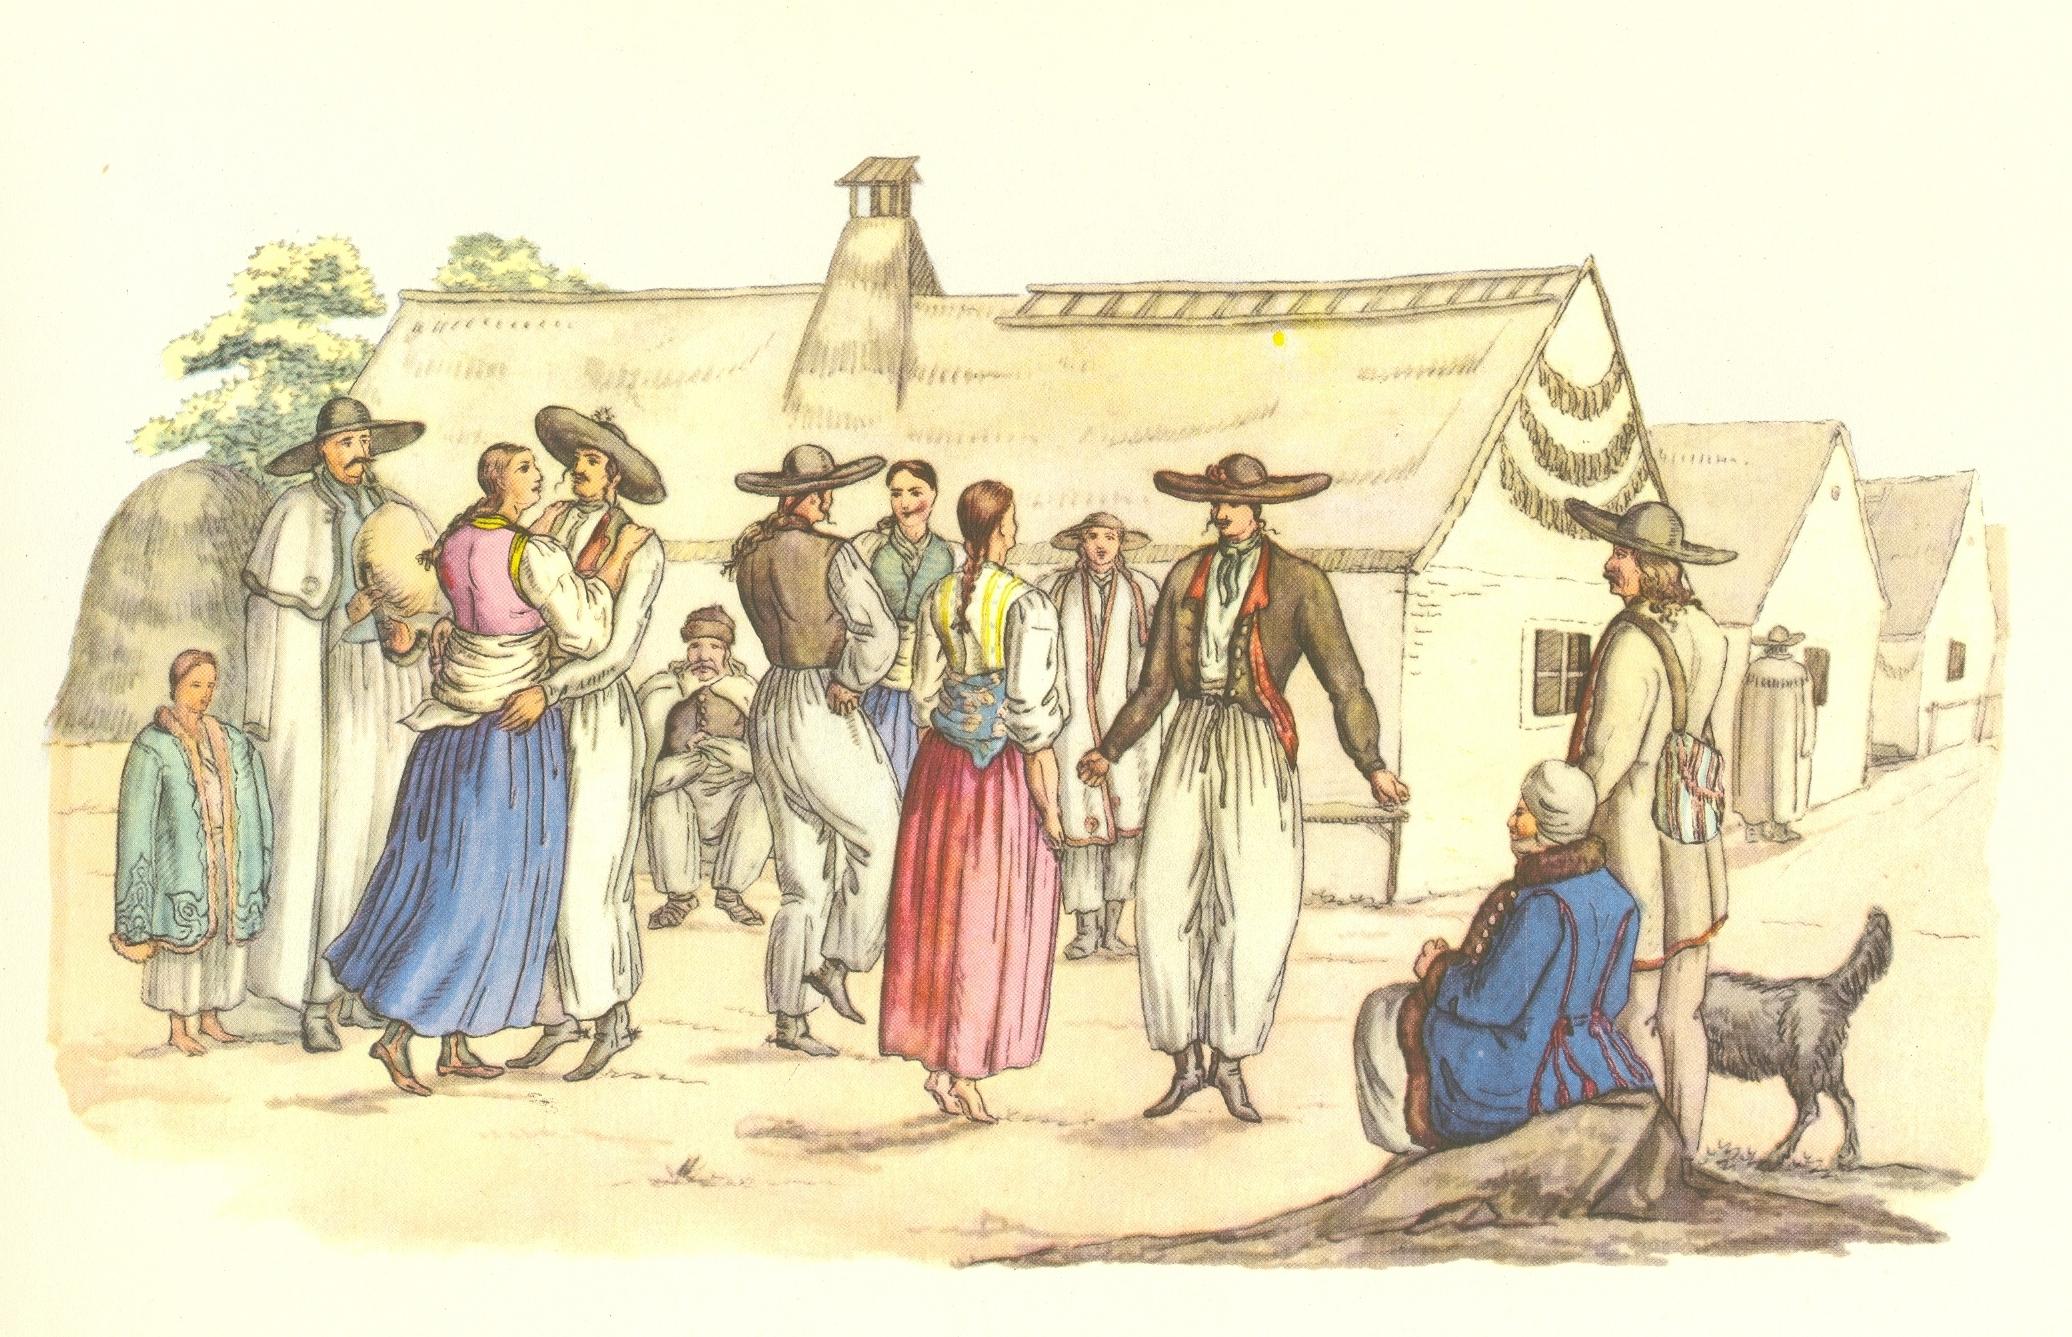 File:Adonyi lakodalom 1822.jpg